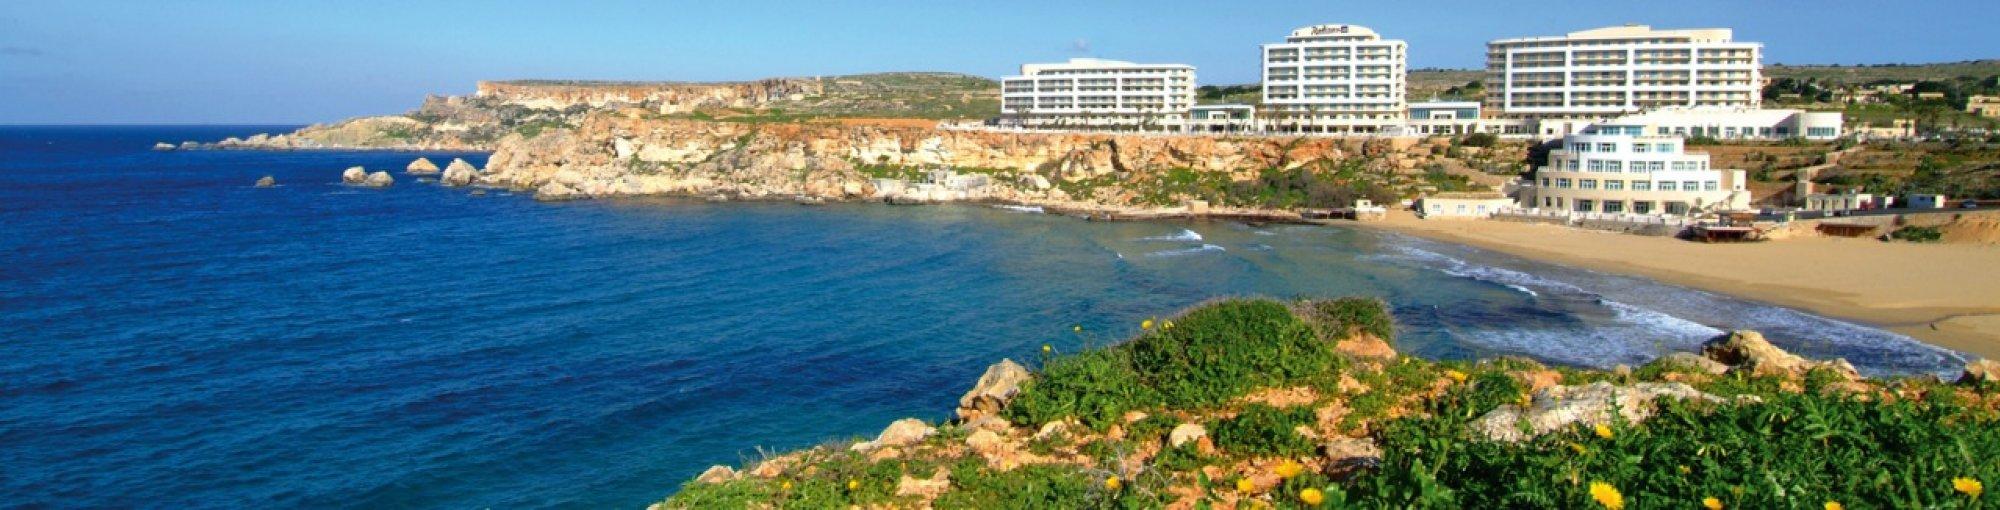 Radisson Blue Golden Sands Resort & Spa